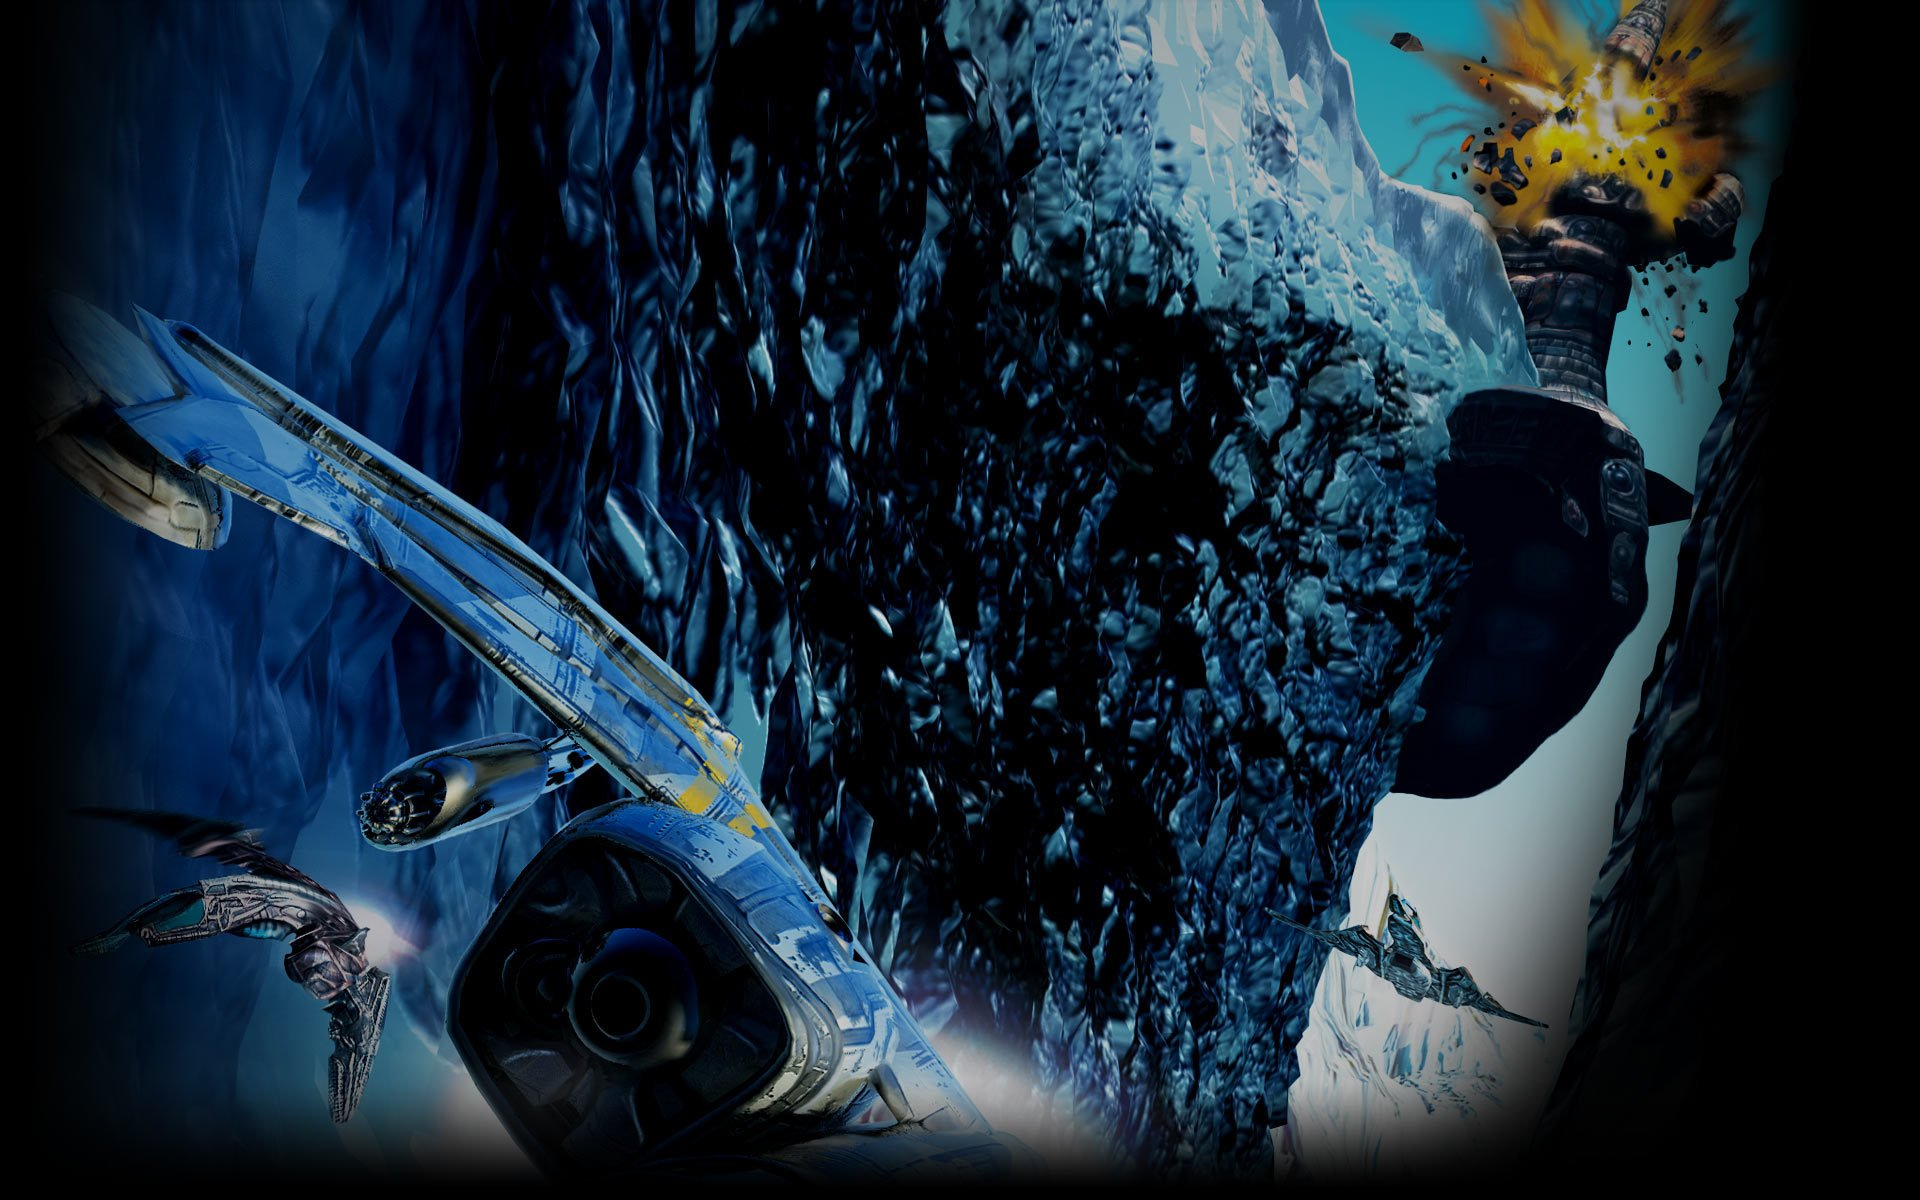 4 Echelon: Wind Warriors HD Wallpapers